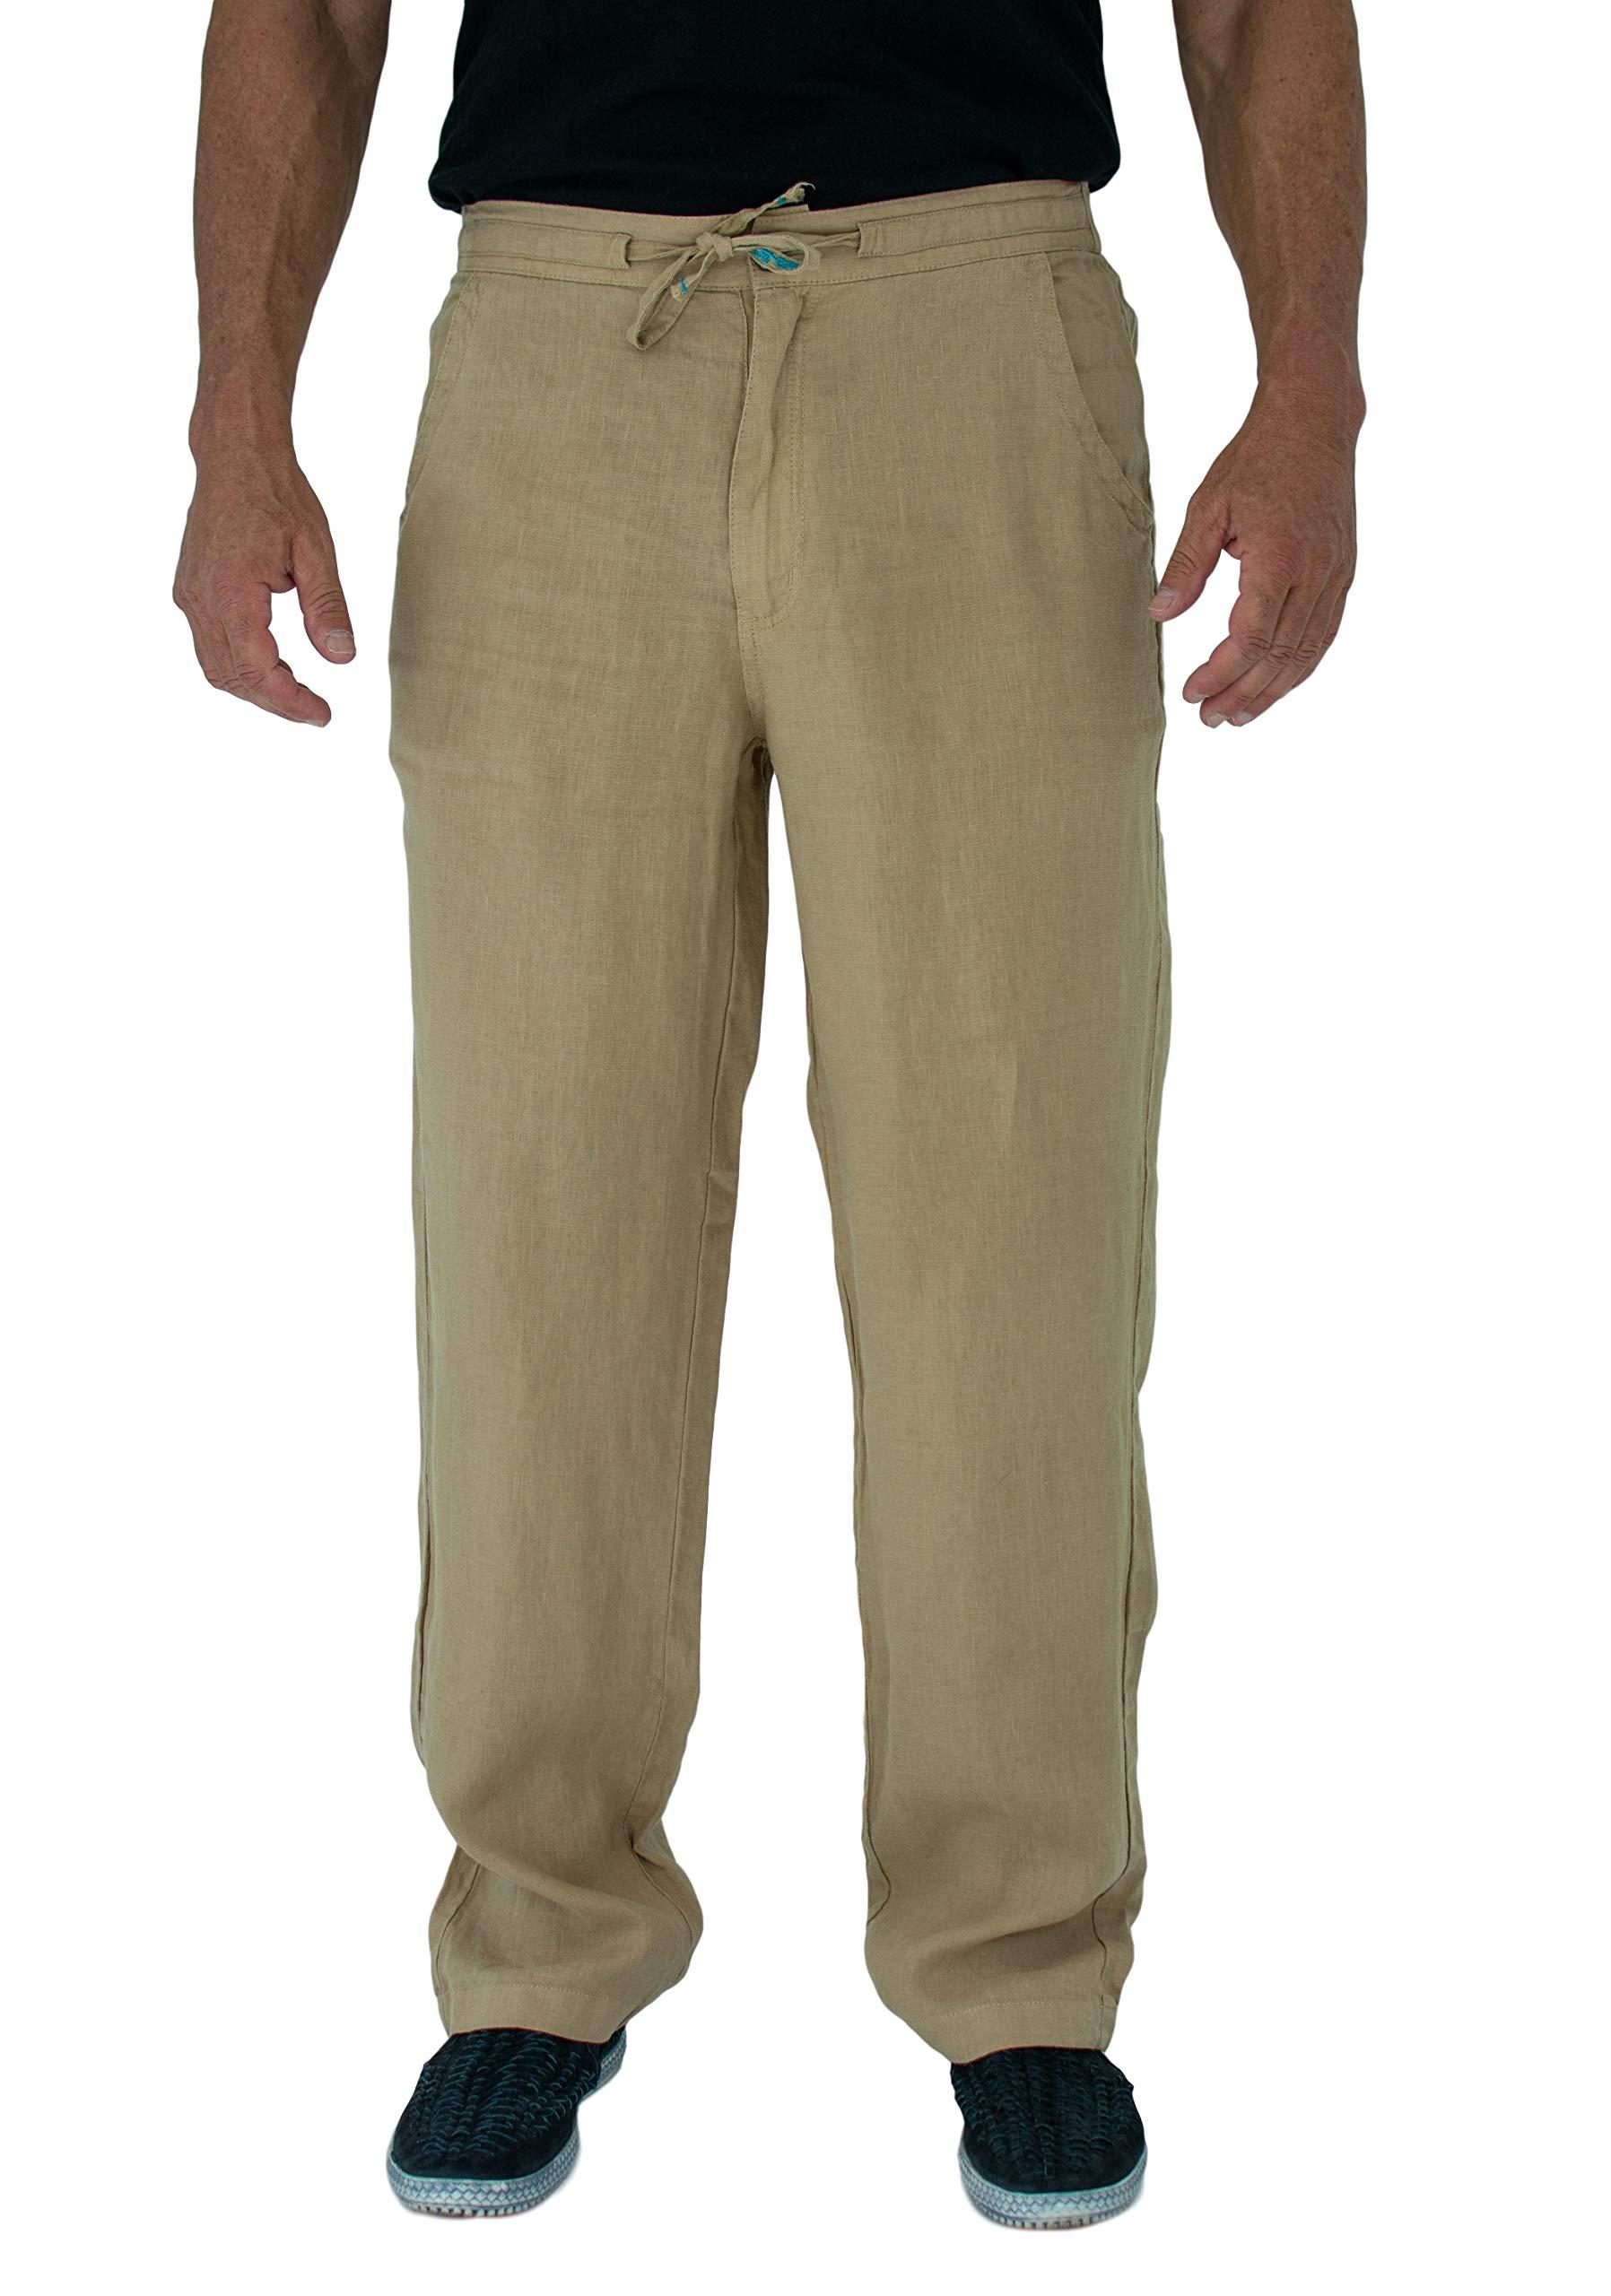 Short Fin Men's 100% Linen Drawstring Pants with Elastic Waistband (L8021L Khaki 40X30)